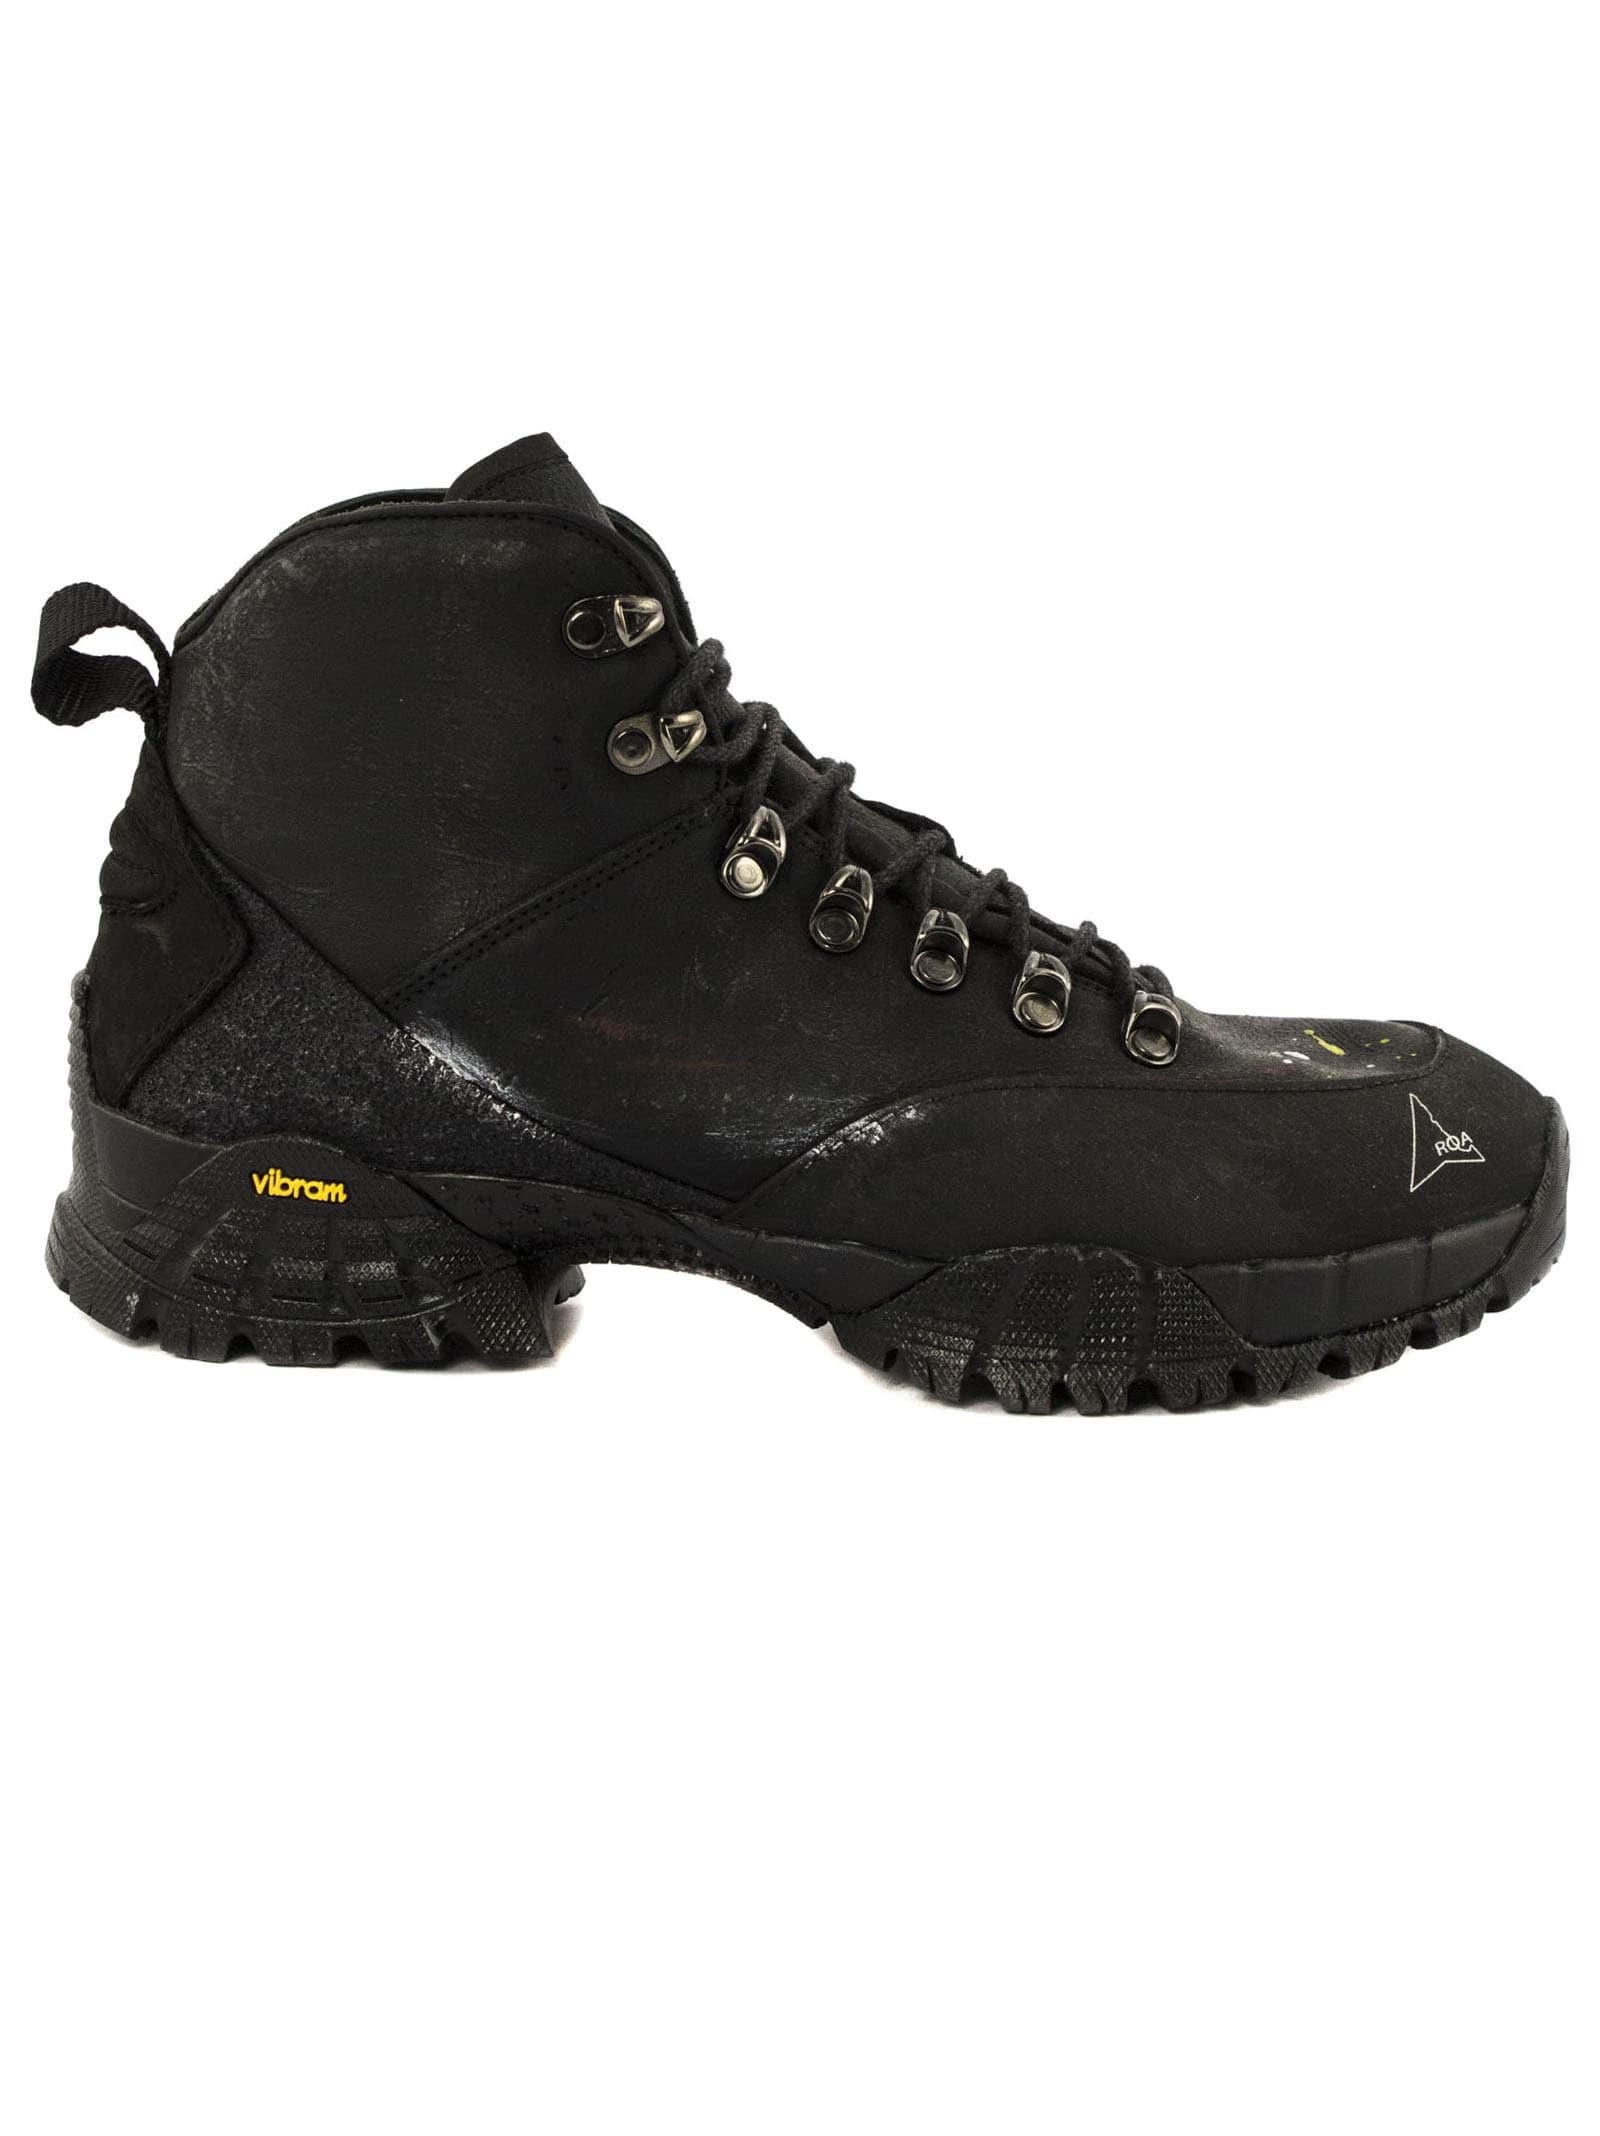 ROA Black Leather Boots